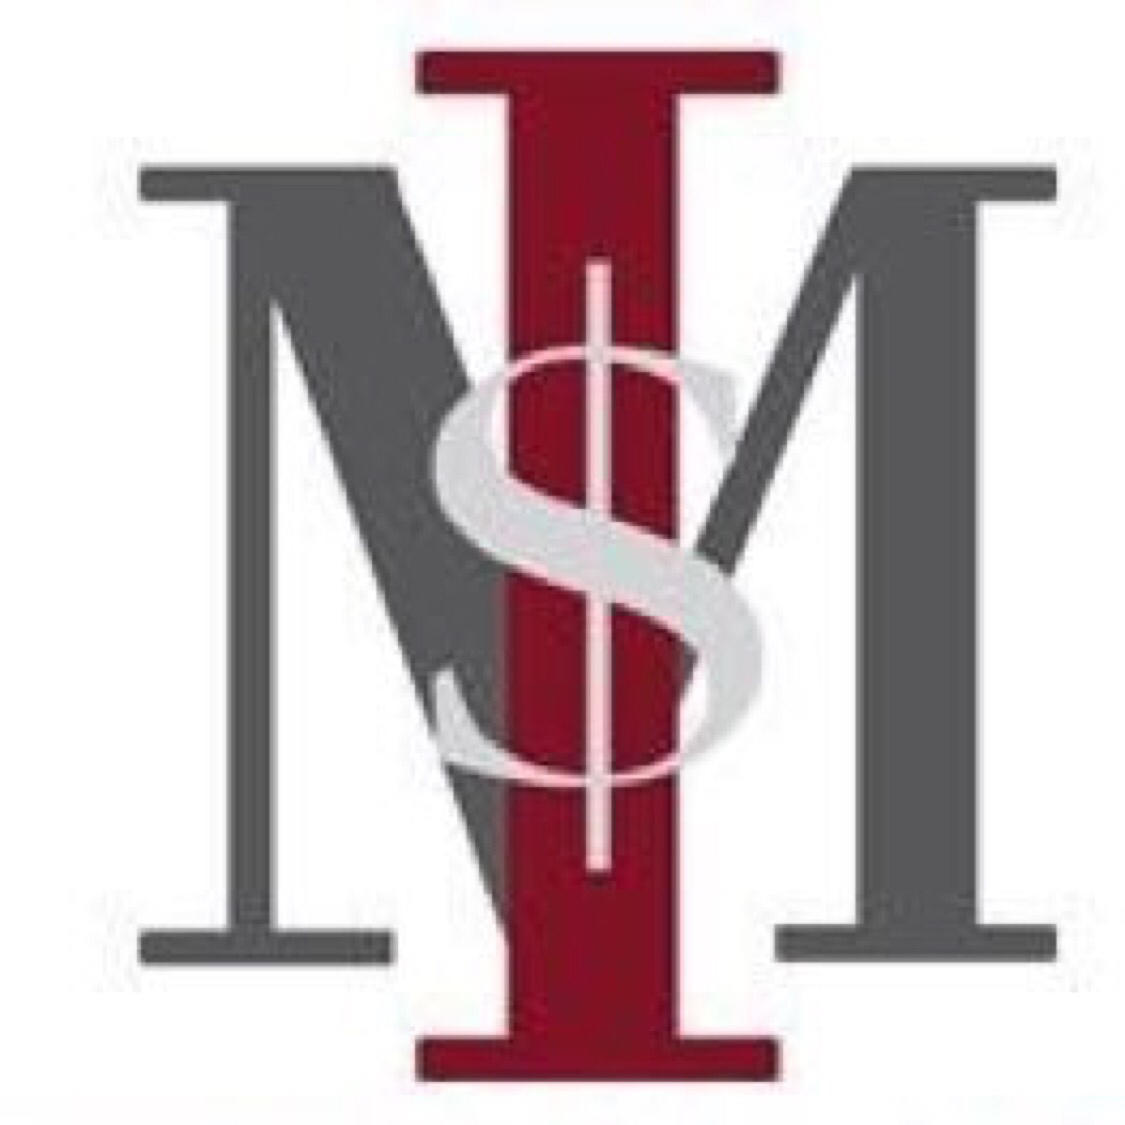 Integrative Medical Billing and Coding Solutions, LLC image 2